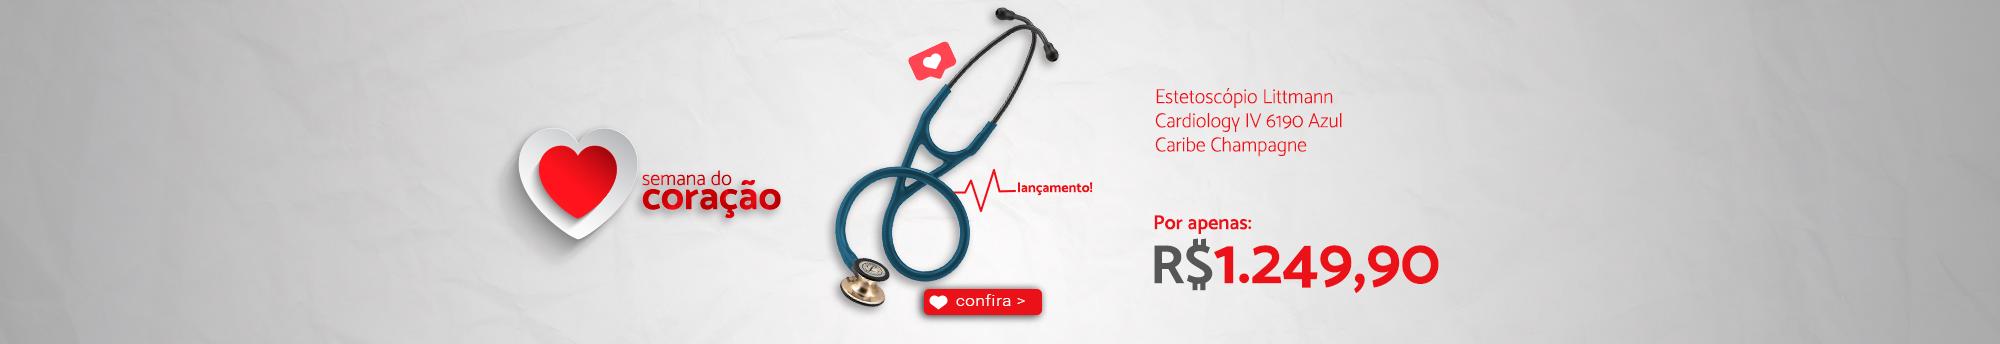 Littmann Cardiology